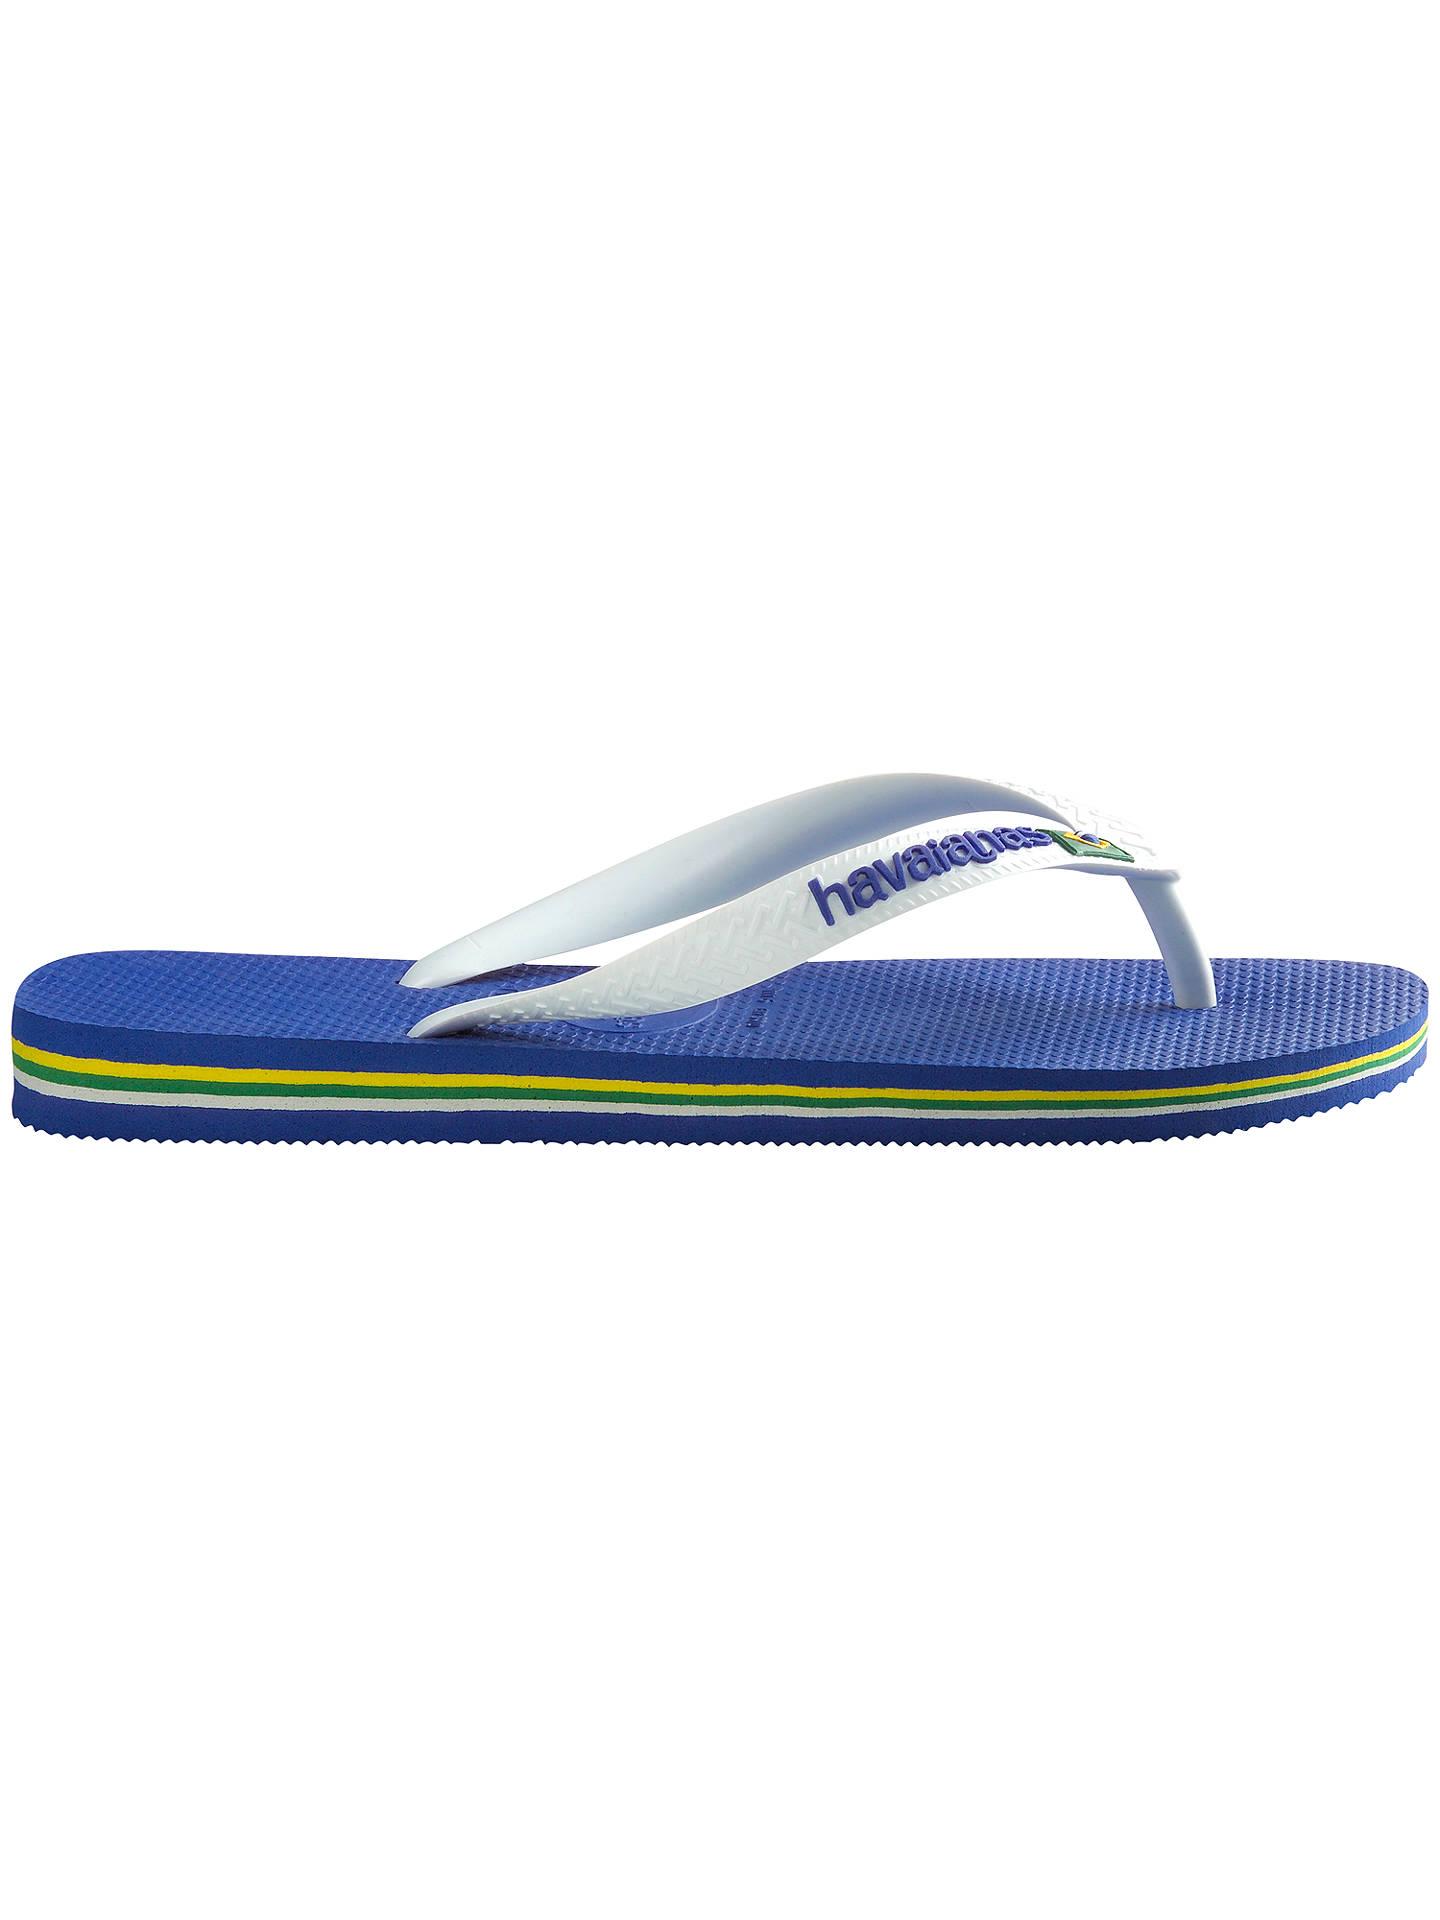 1088deac28c7 Buy Havaianas Brasil Logo Flip Flops